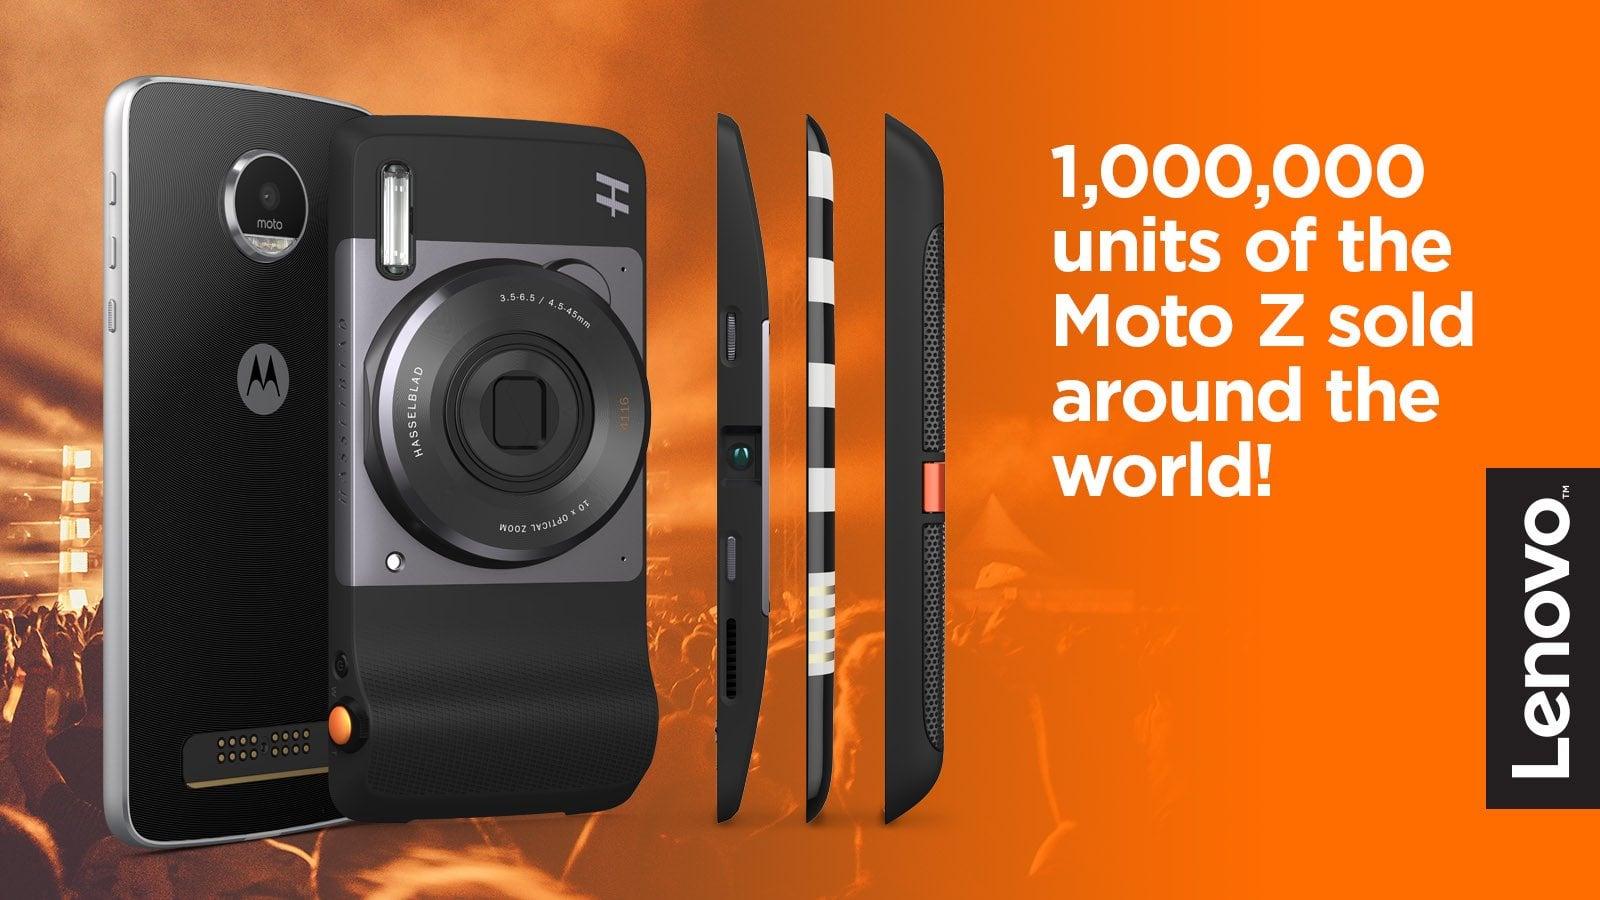 motorola-lenovo-moto-z-1-milion-units-sold